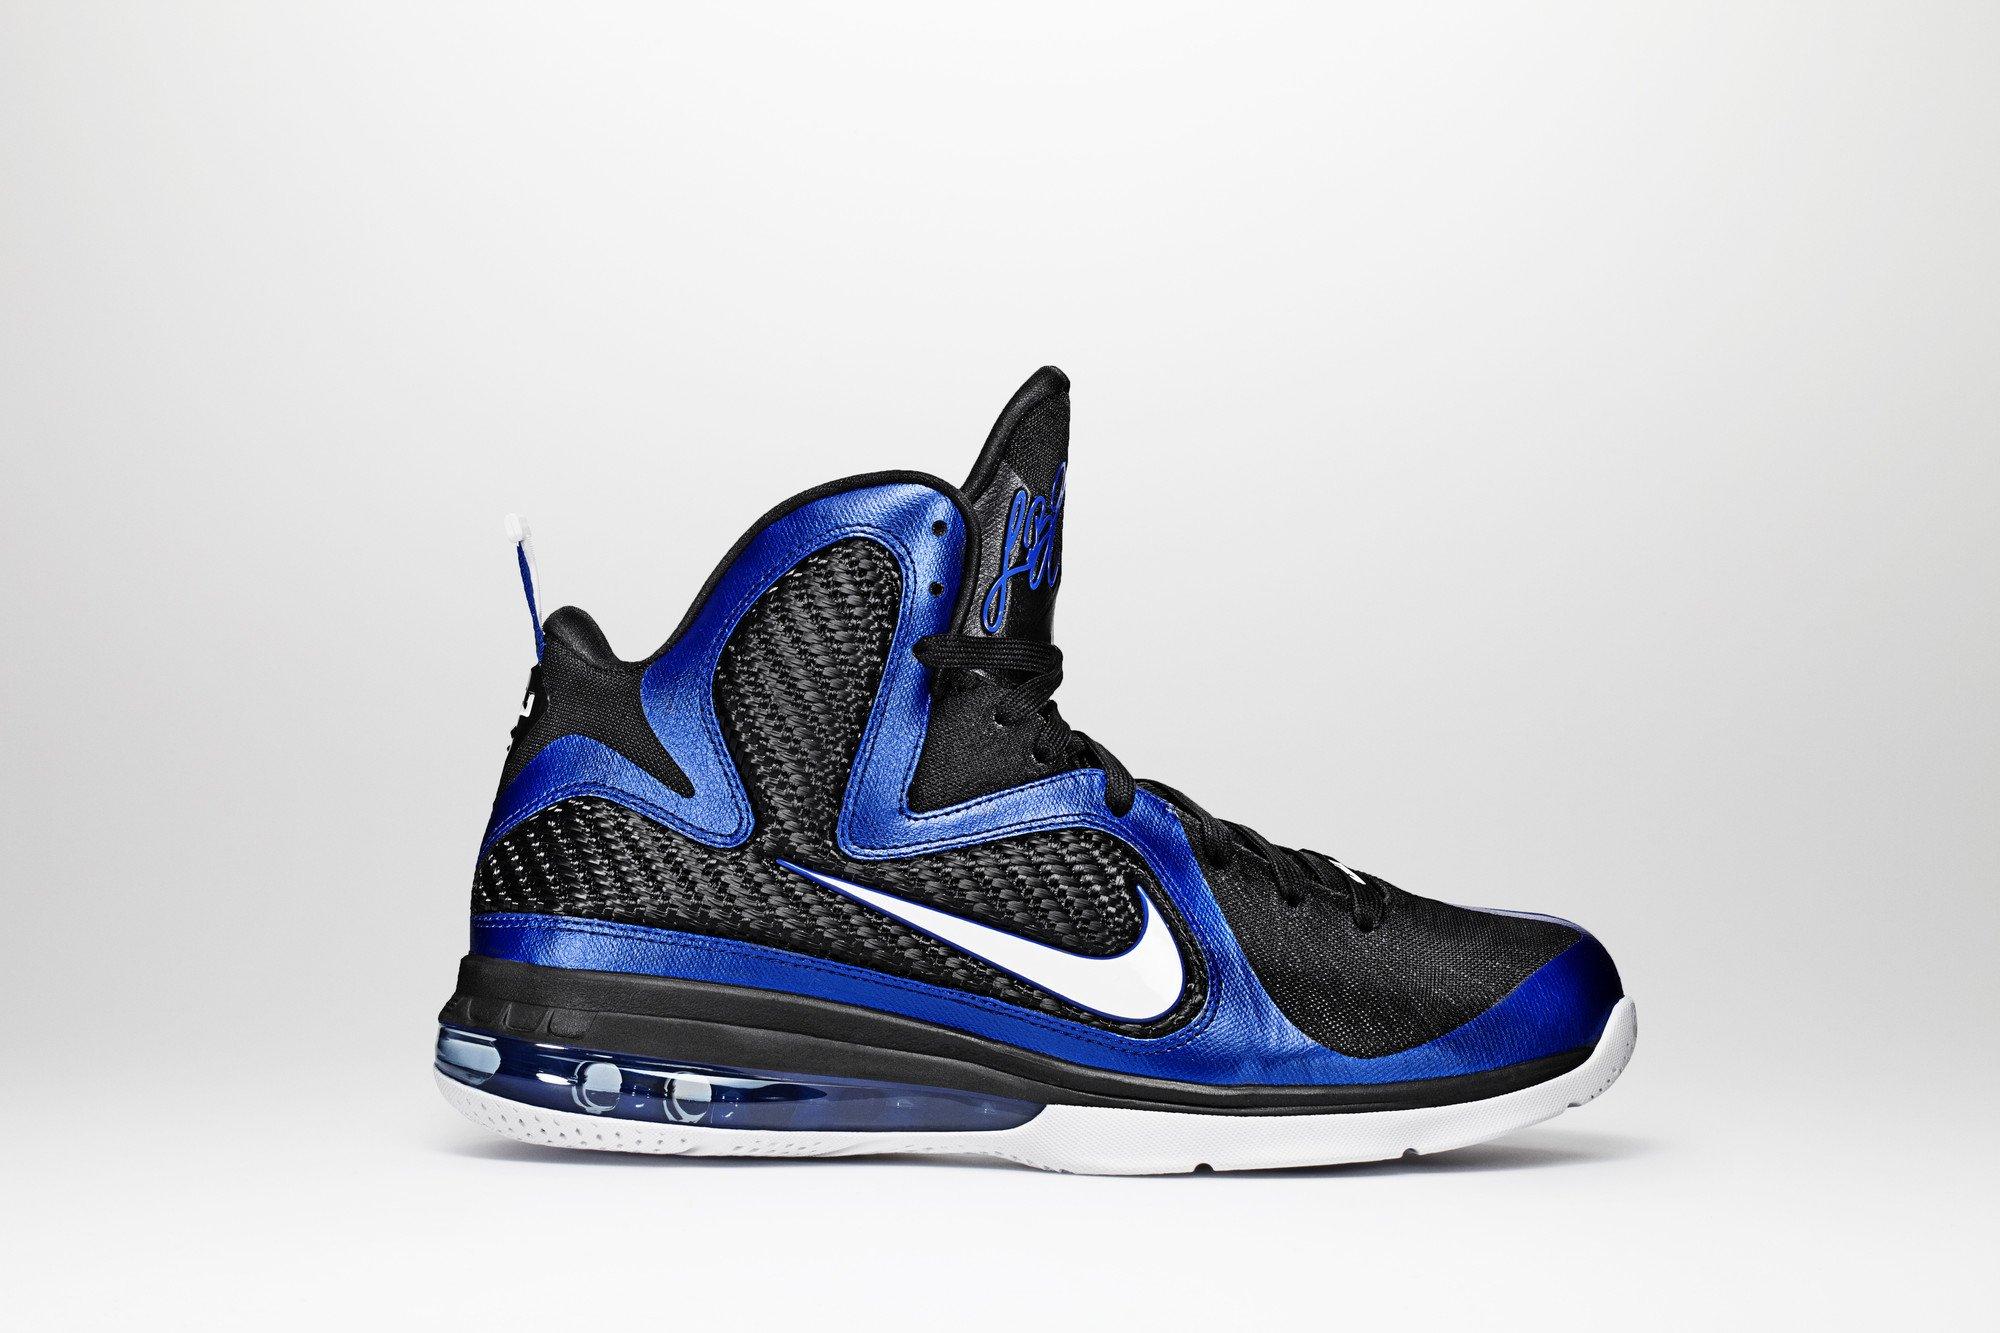 �9�+��ky����a_ReleaseReminder:NikeLeBron9Kentucky|SneakerFiles